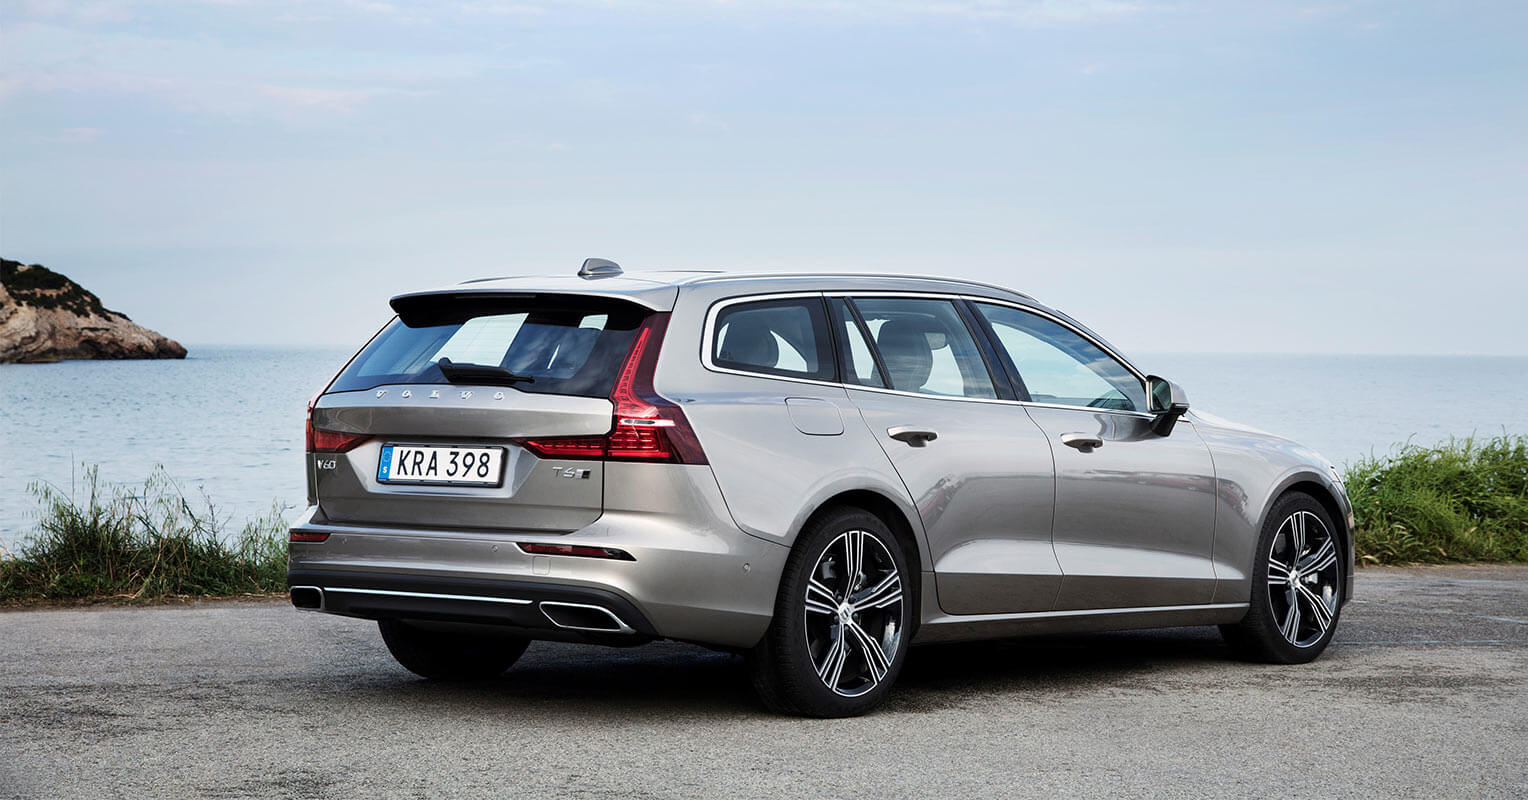 Trasera del Volvo V60 2018